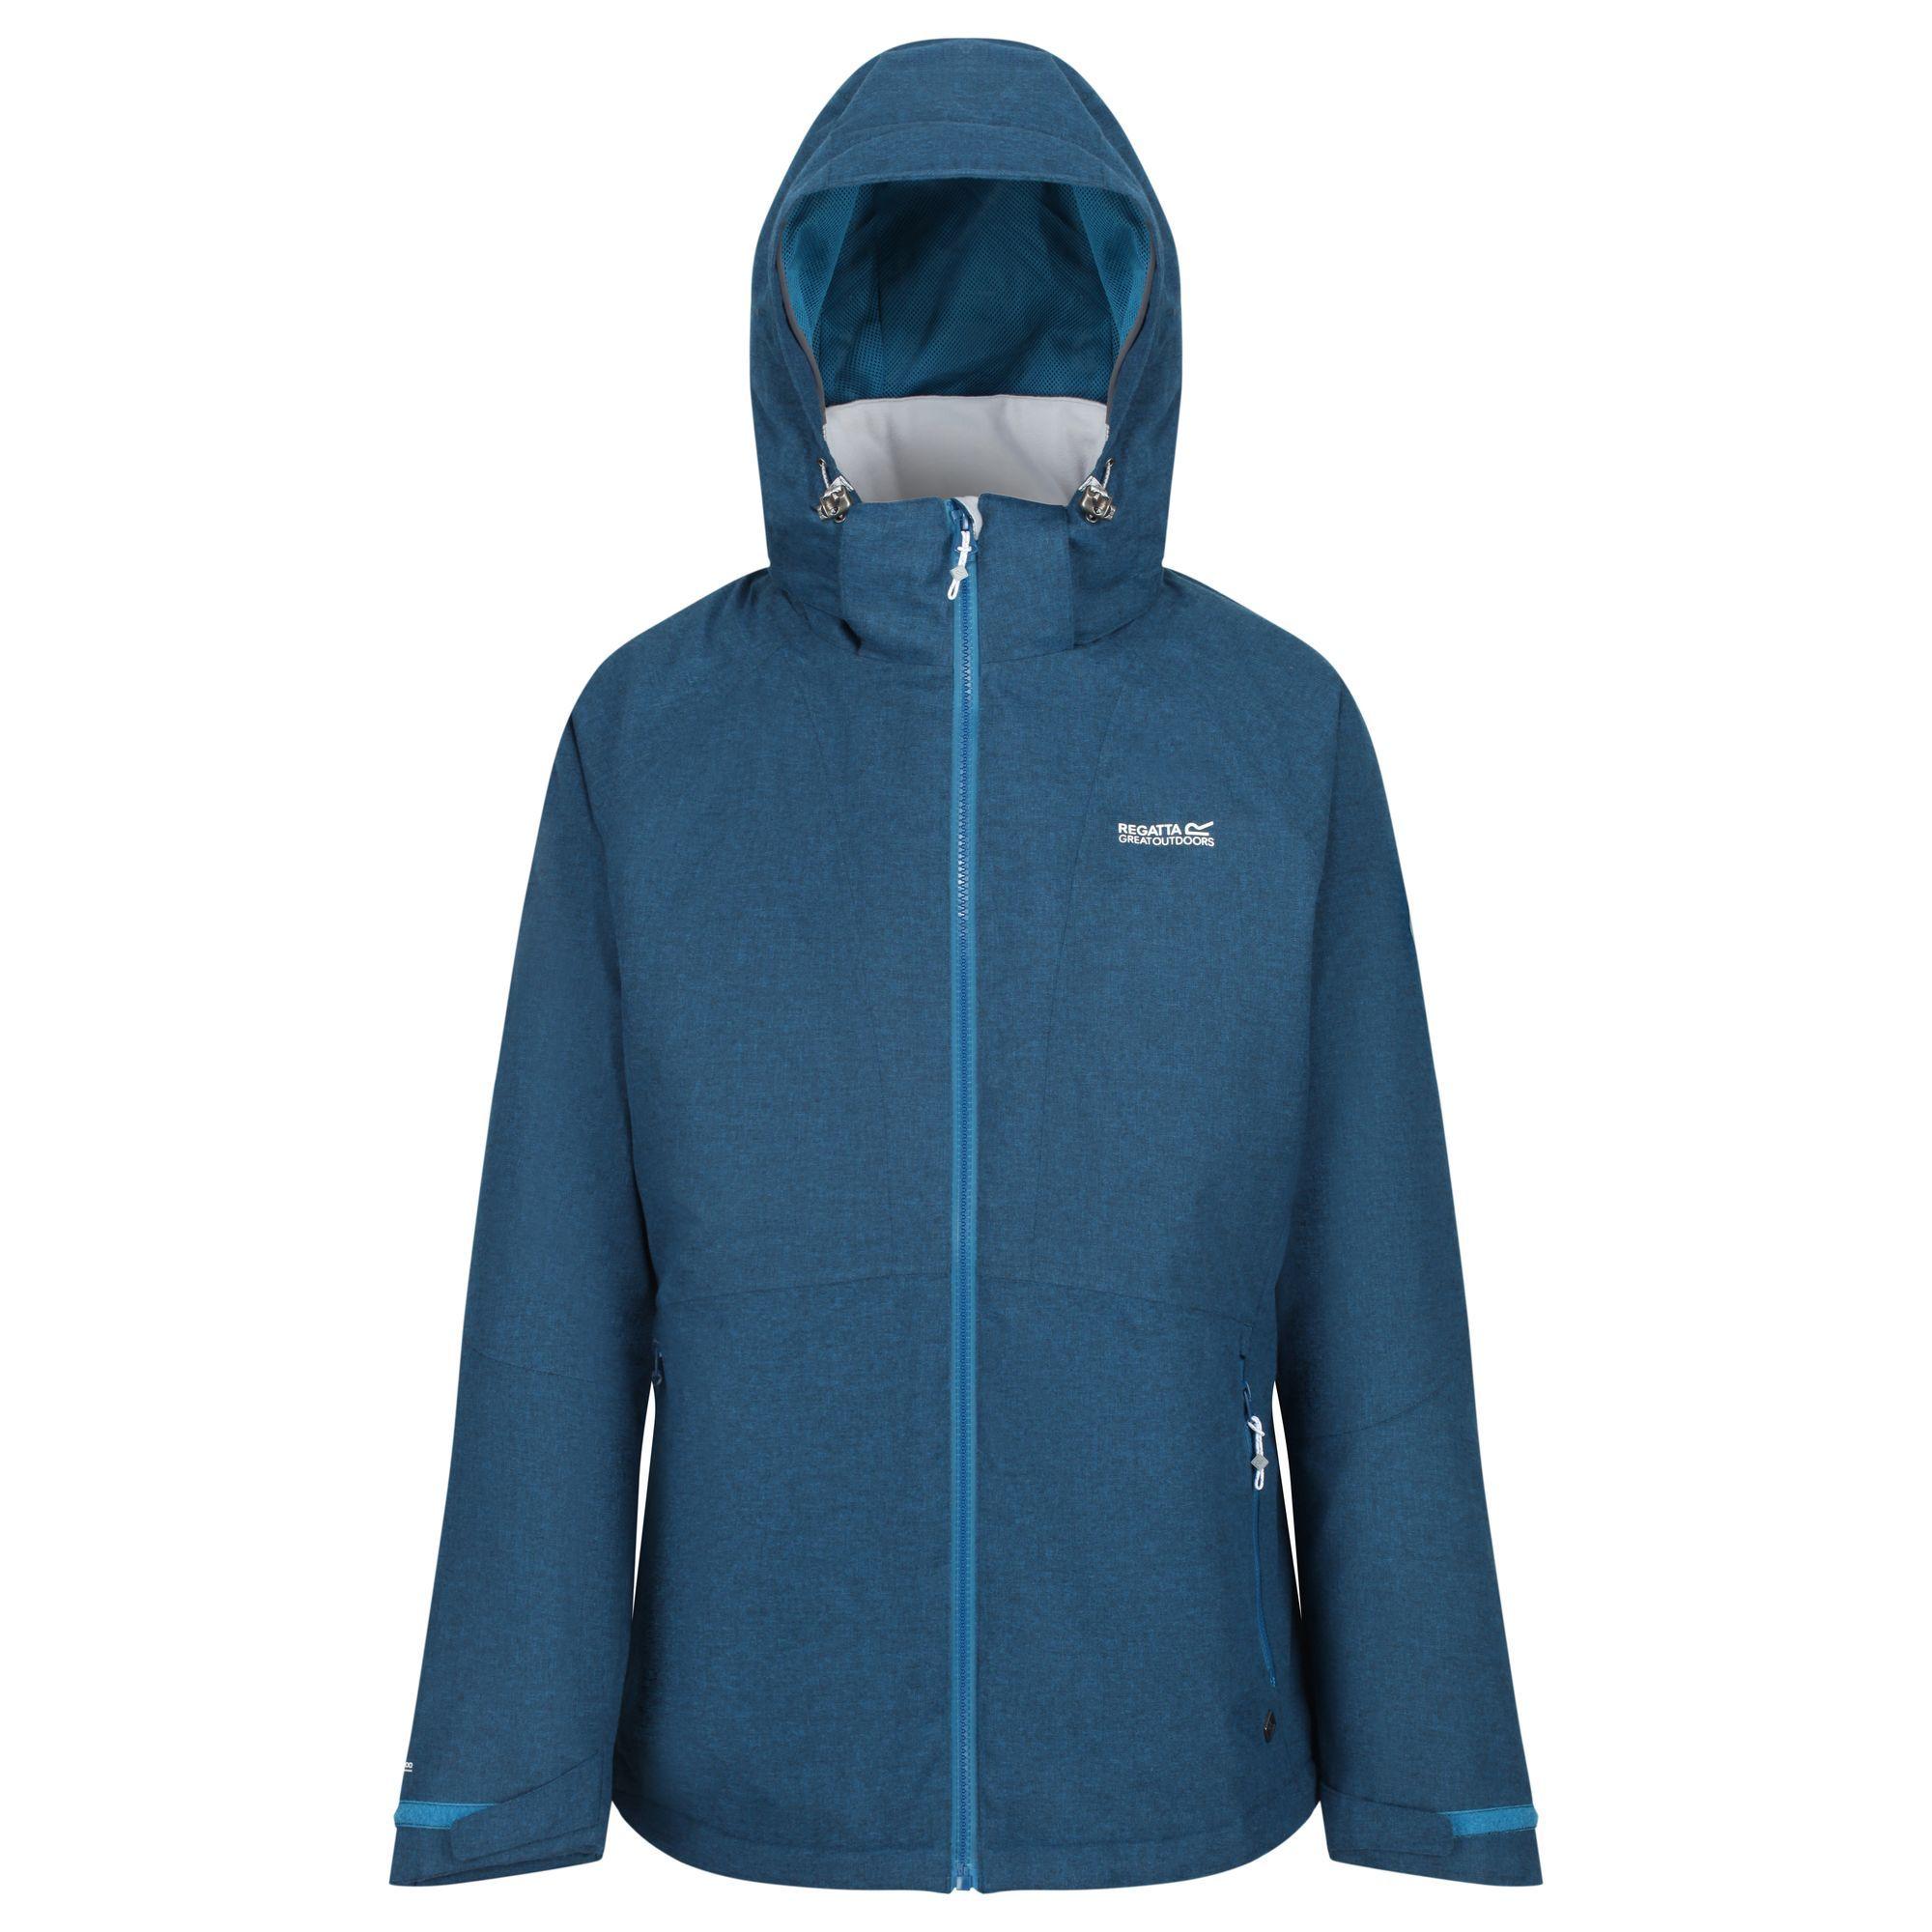 Regatta Womens/Ladies Highside IV Waterproof Insulated Jacket